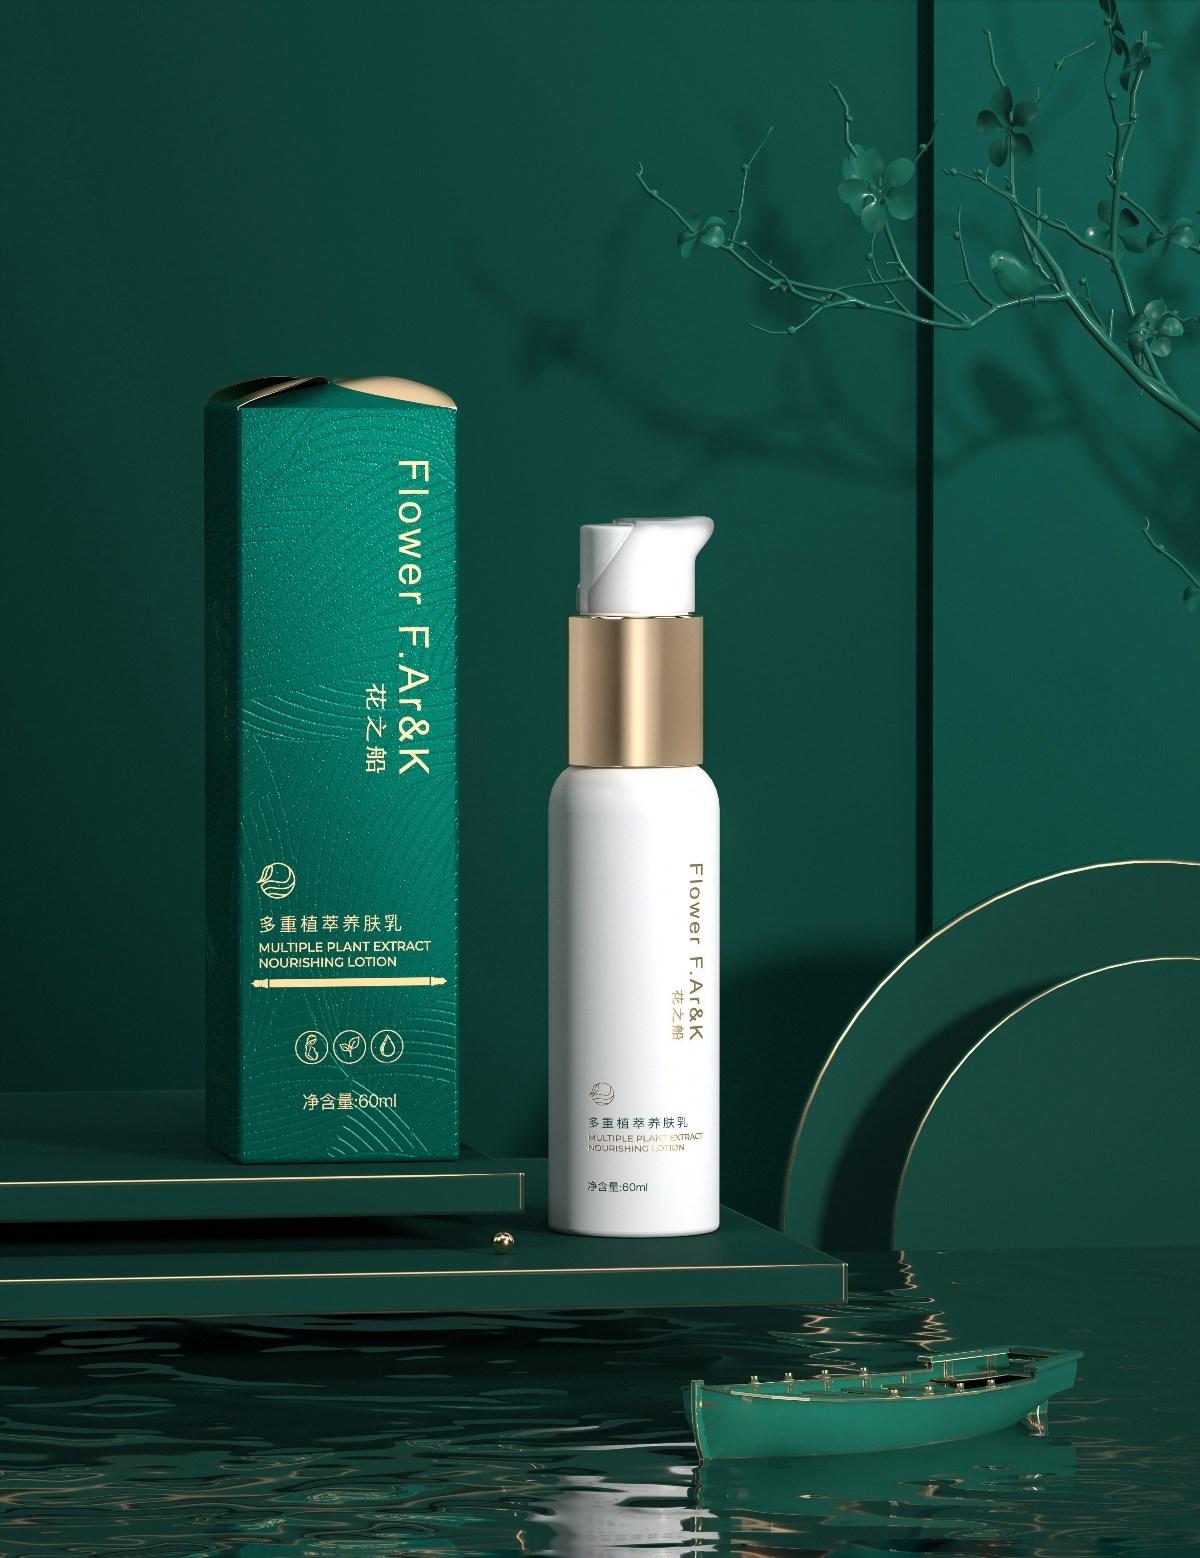 Hellolink | 花之船中式轻奢护肤化妆品美妆包装设计